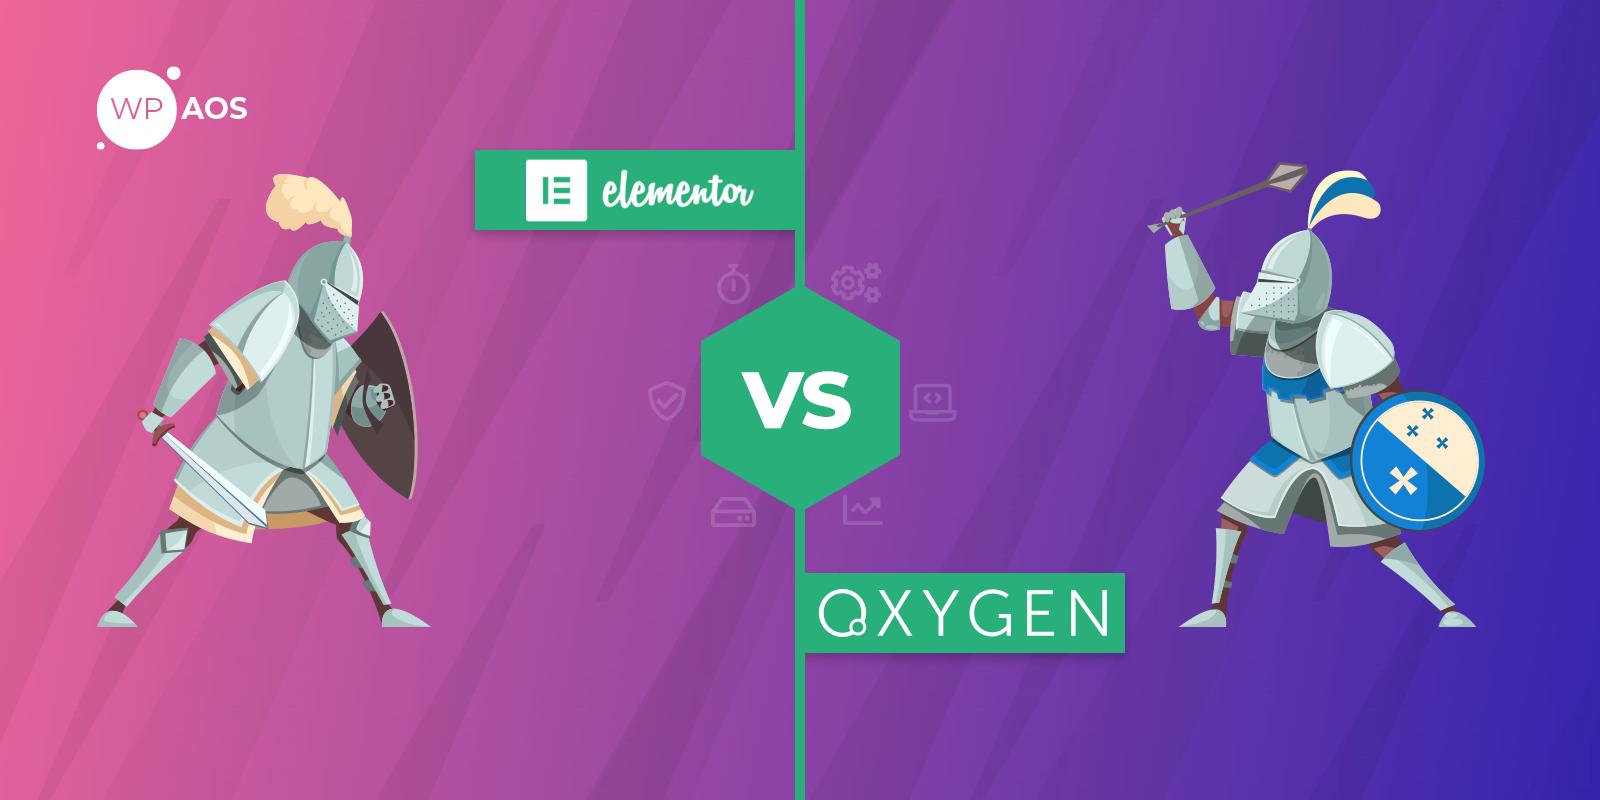 Elementor-VS-Oxygen